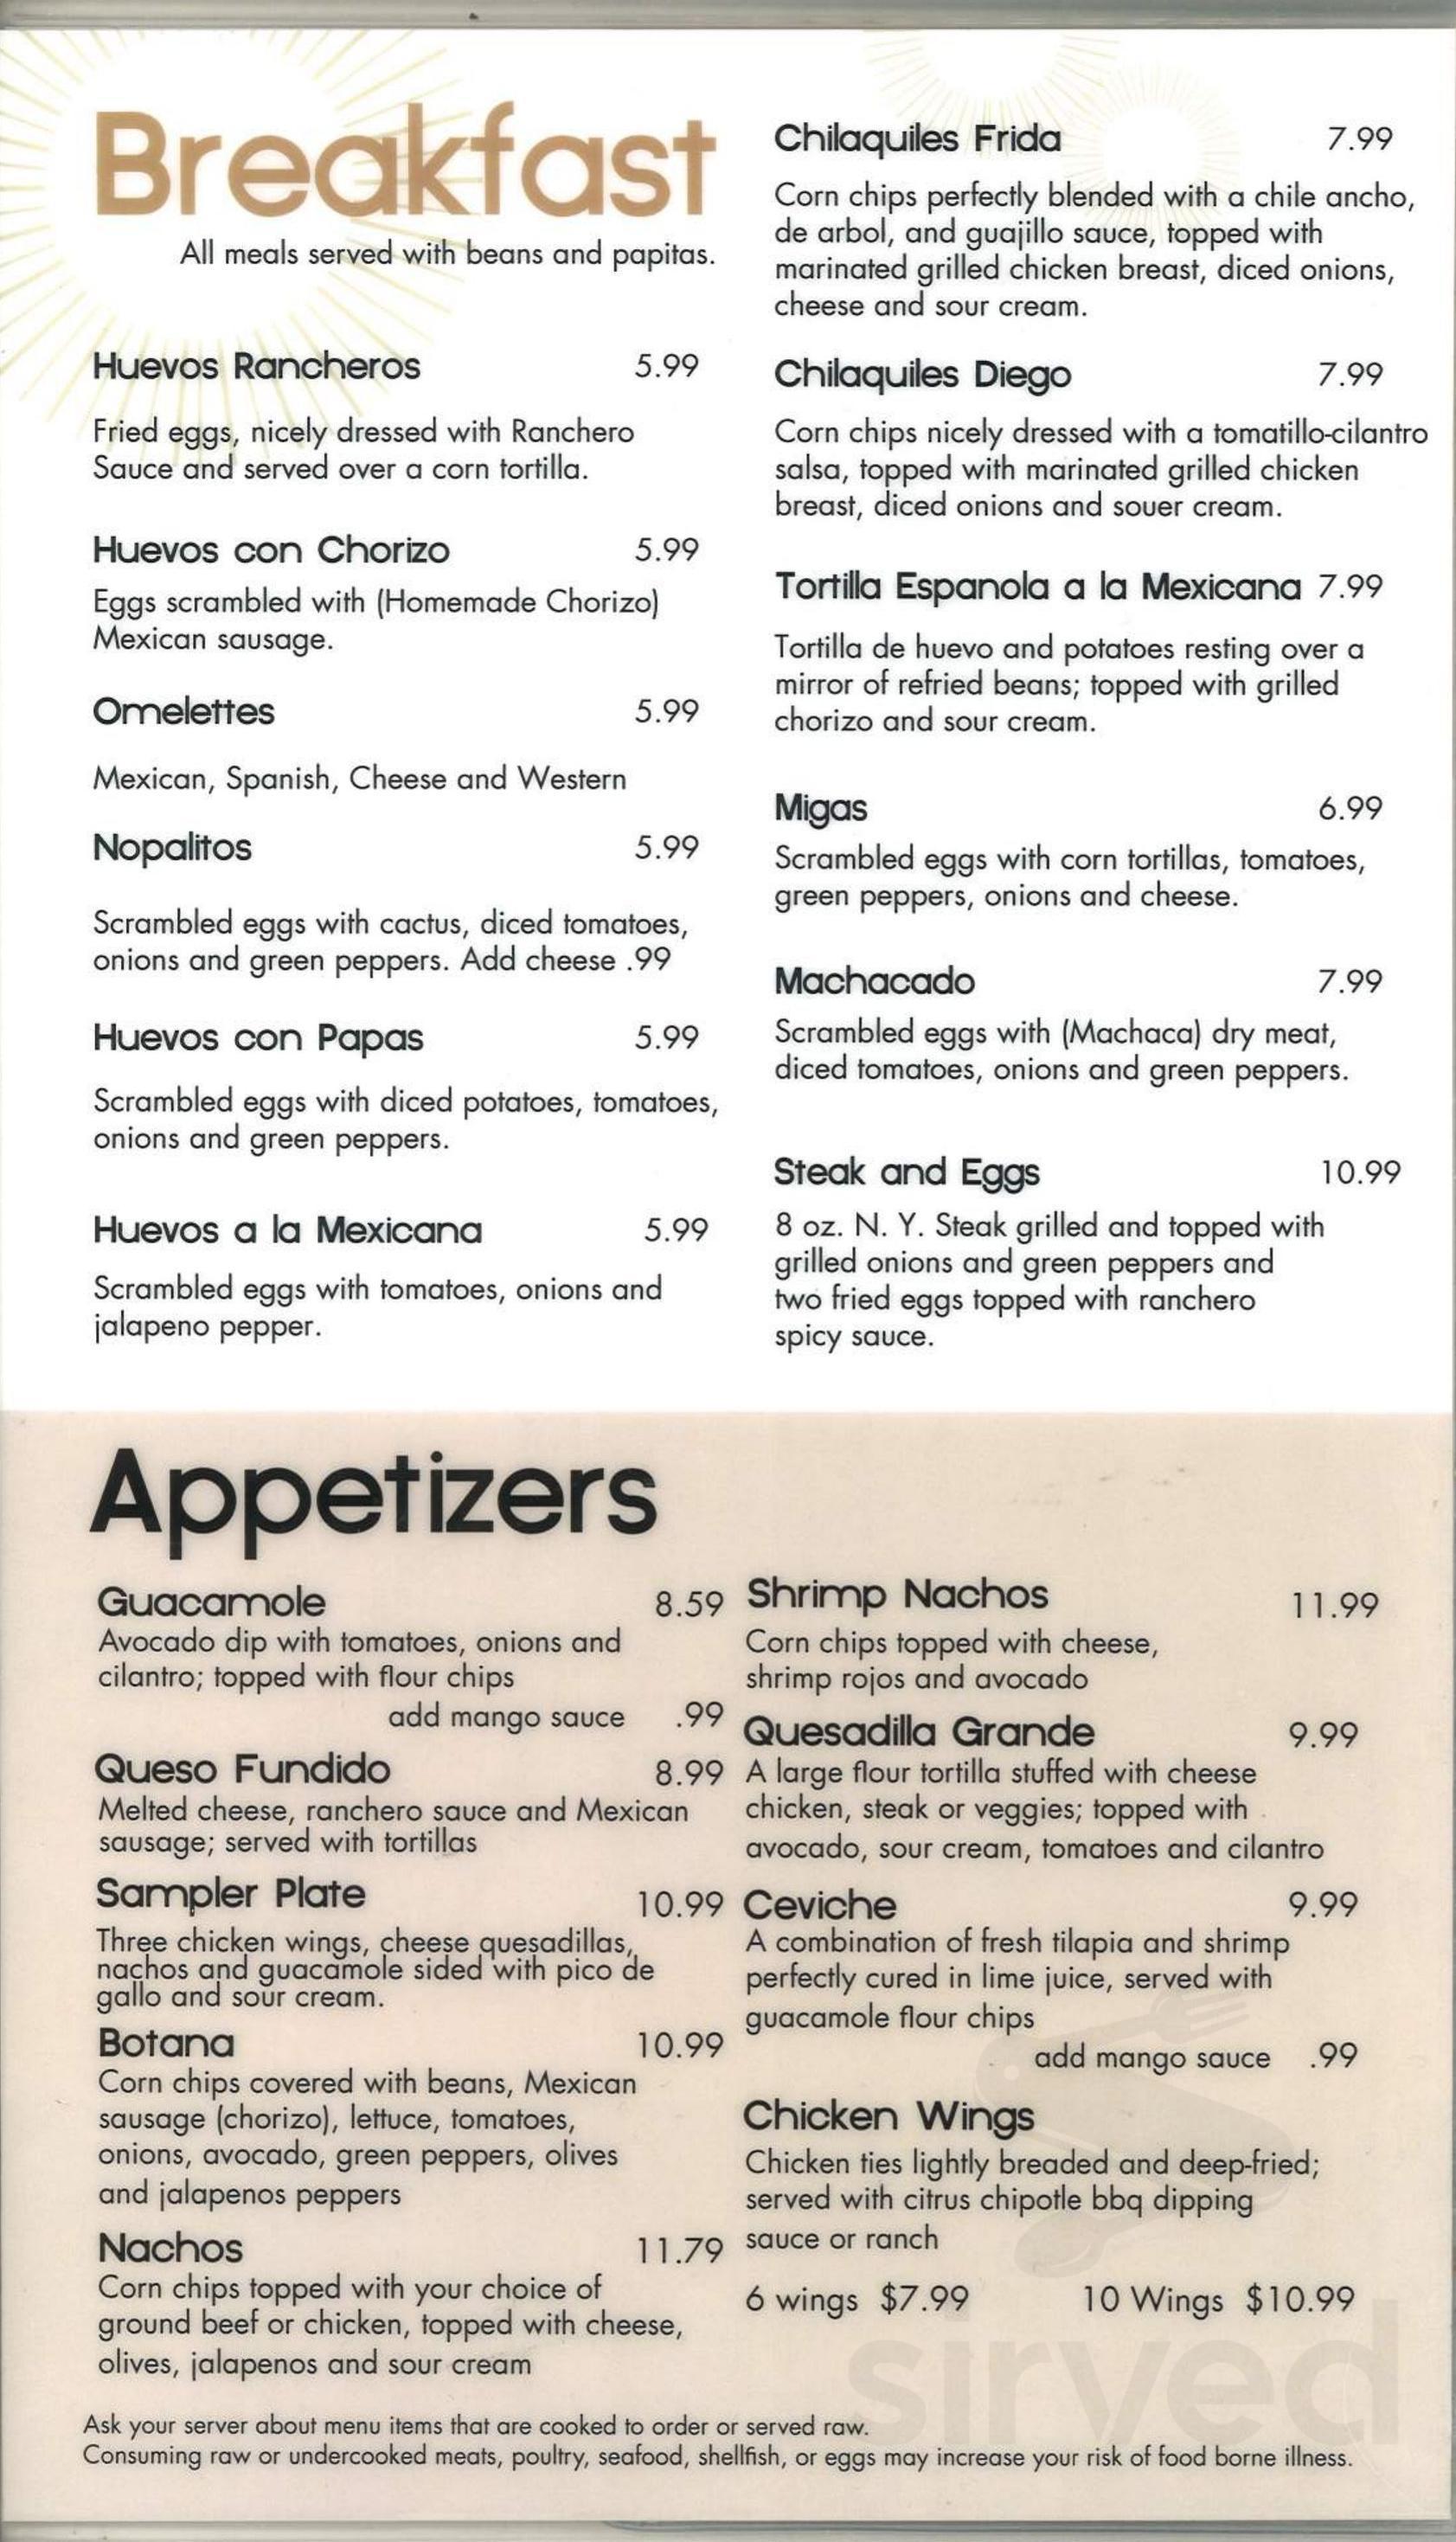 Menu for Frida Mexican Cuisine in Dearborn, Michigan, USA